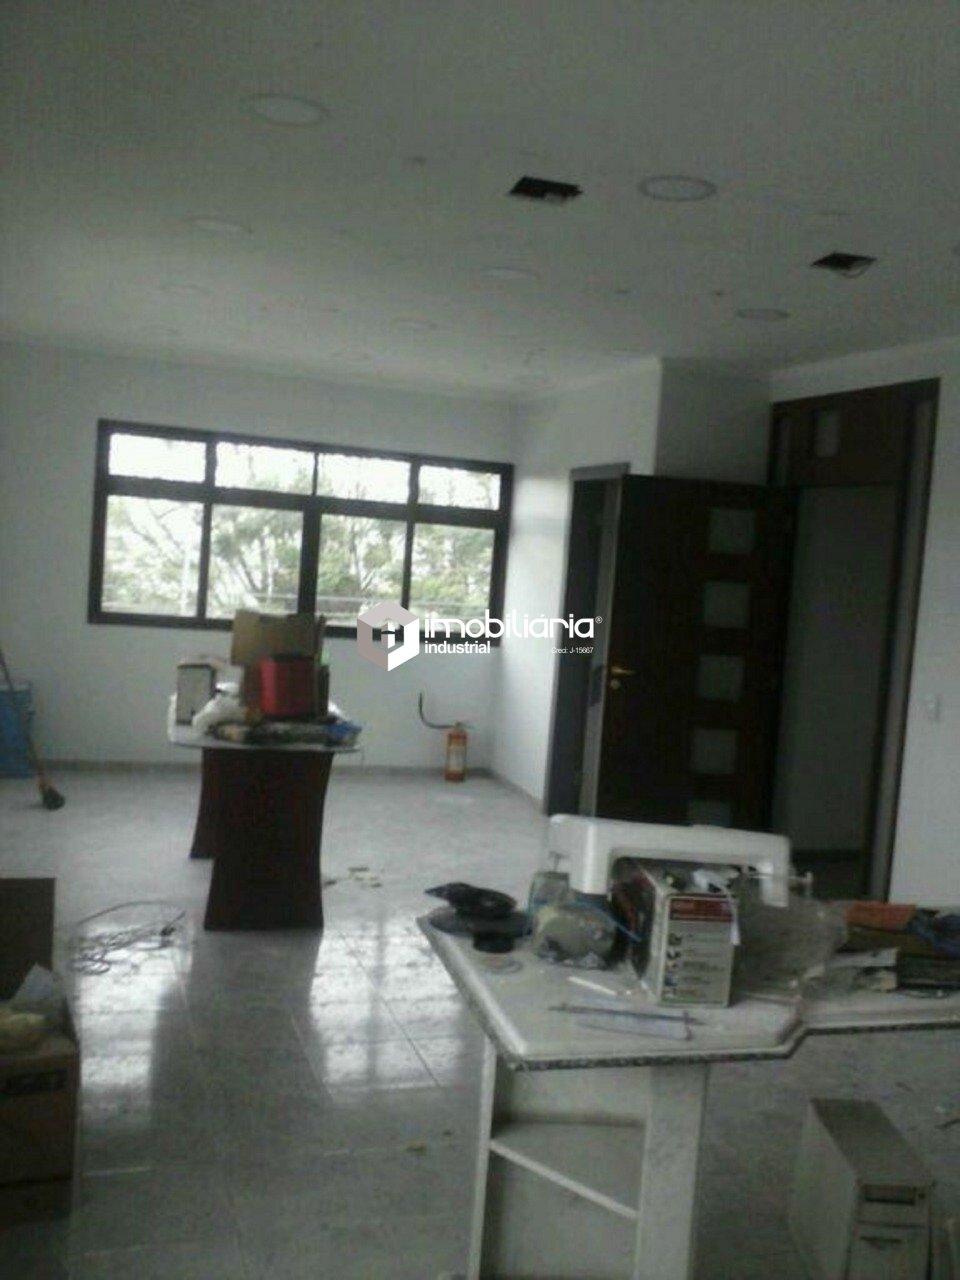 Prédio comercial/residencial para alugar, 500 m² por R$ 12.000,00